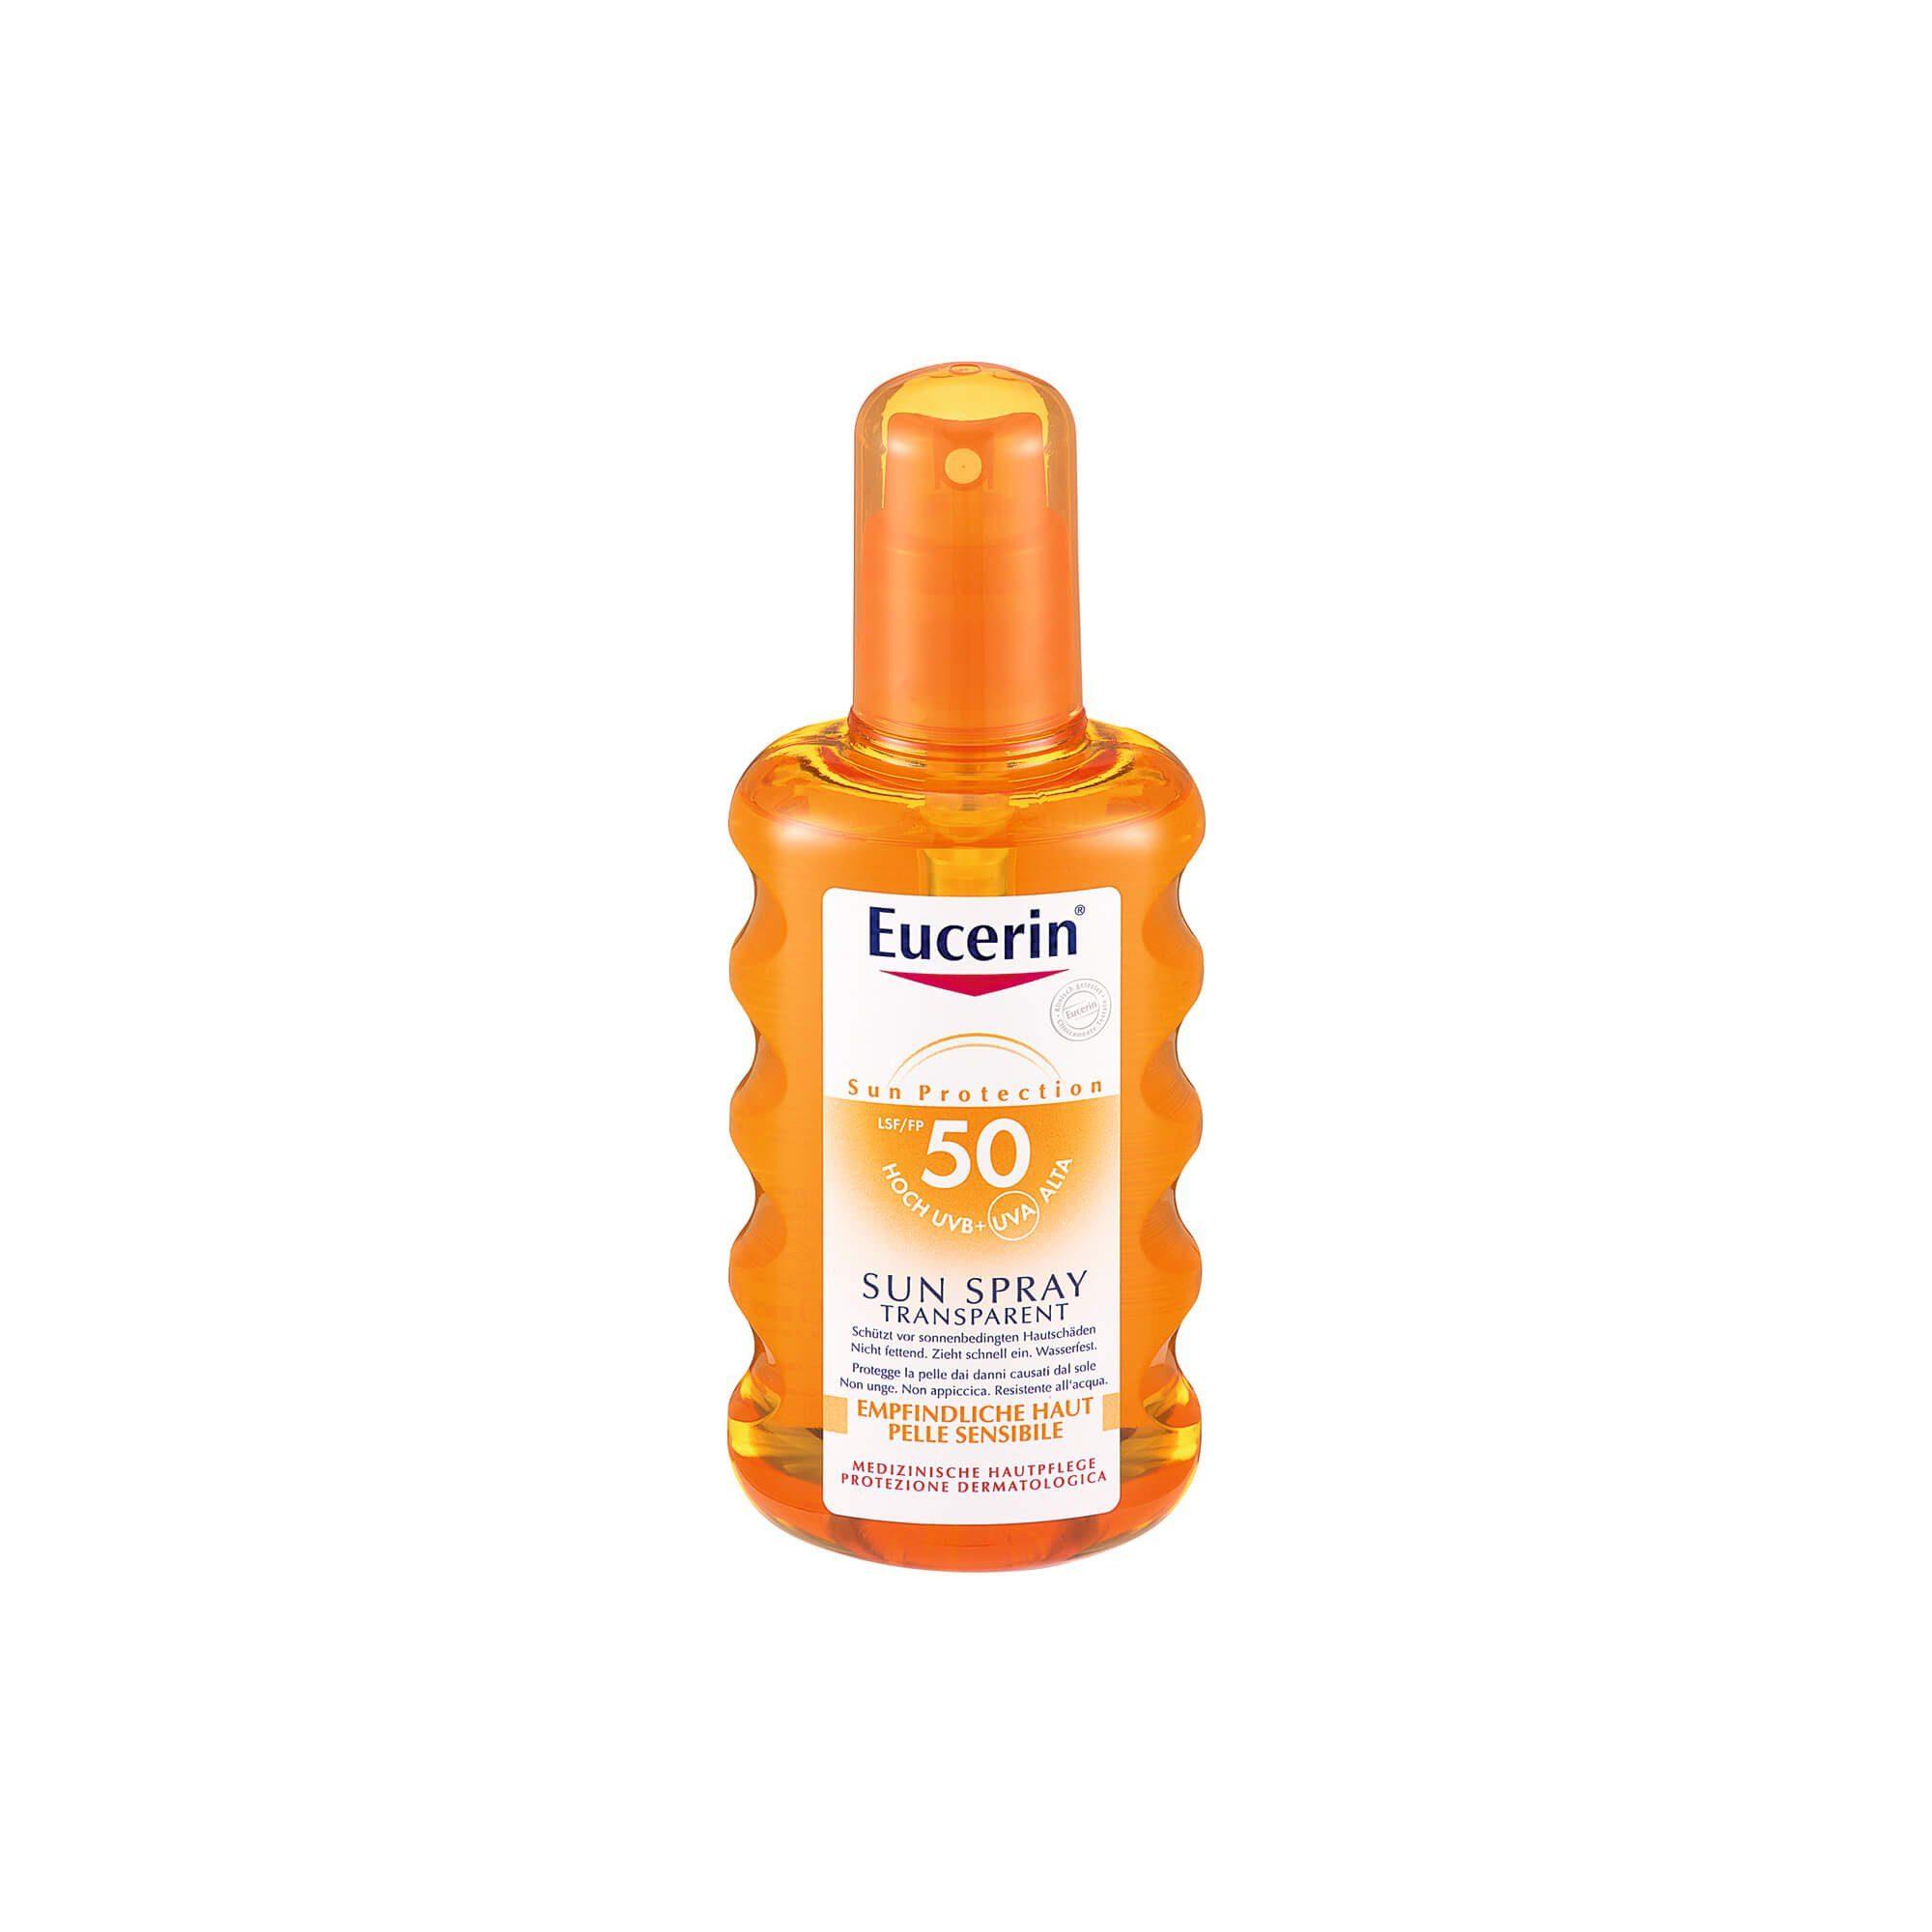 Eucerin Sun Transparent Spray , 200 ml